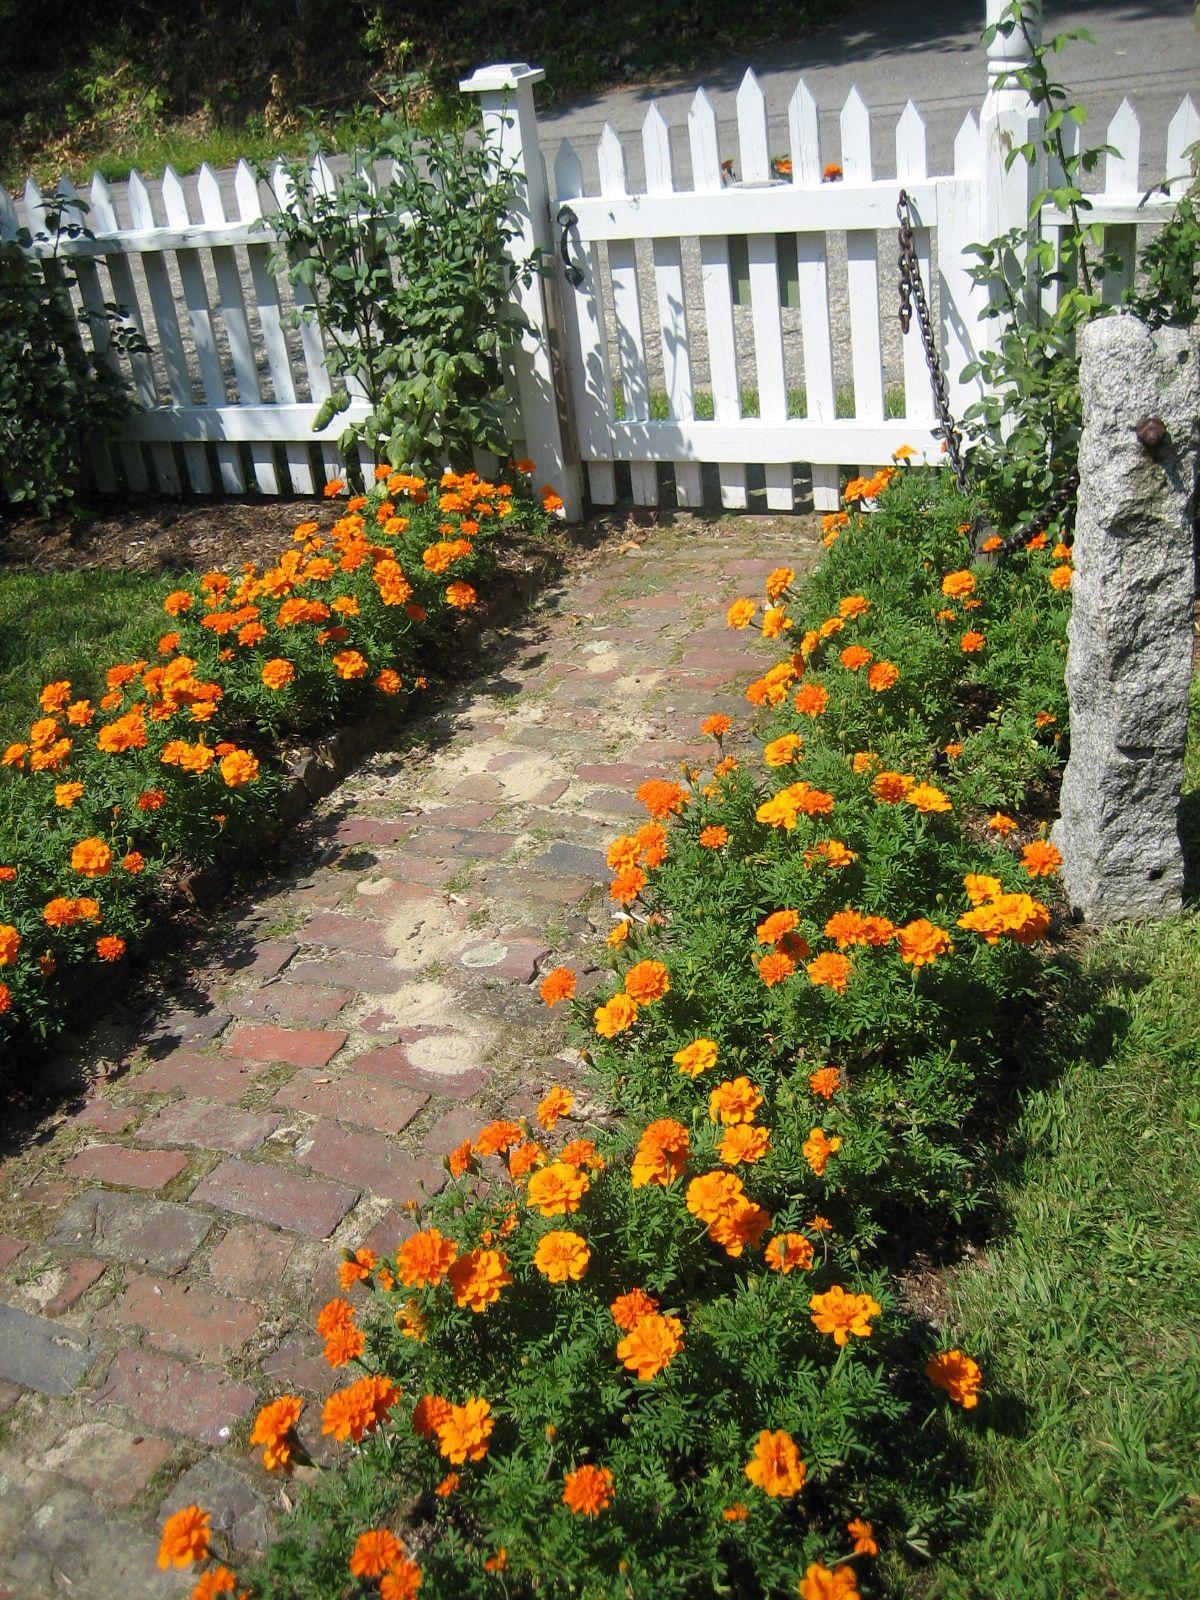 Marigolds Durango Orange Jpg 1 200×1 600 Pixels Garden 400 x 300